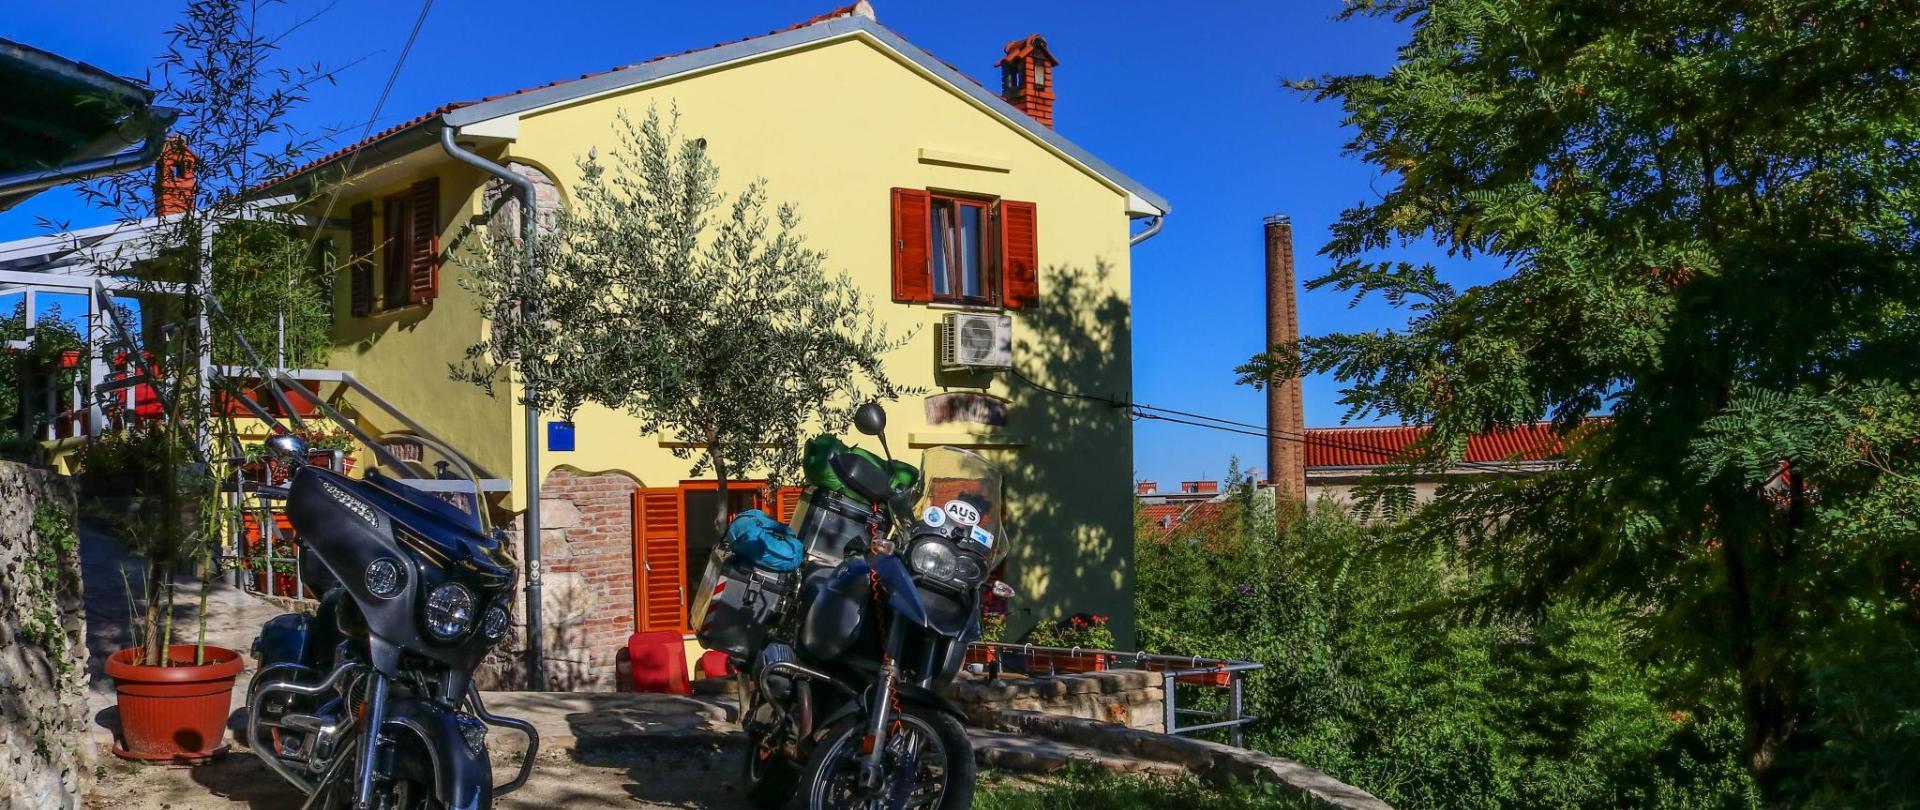 kuca-bikers.jpg